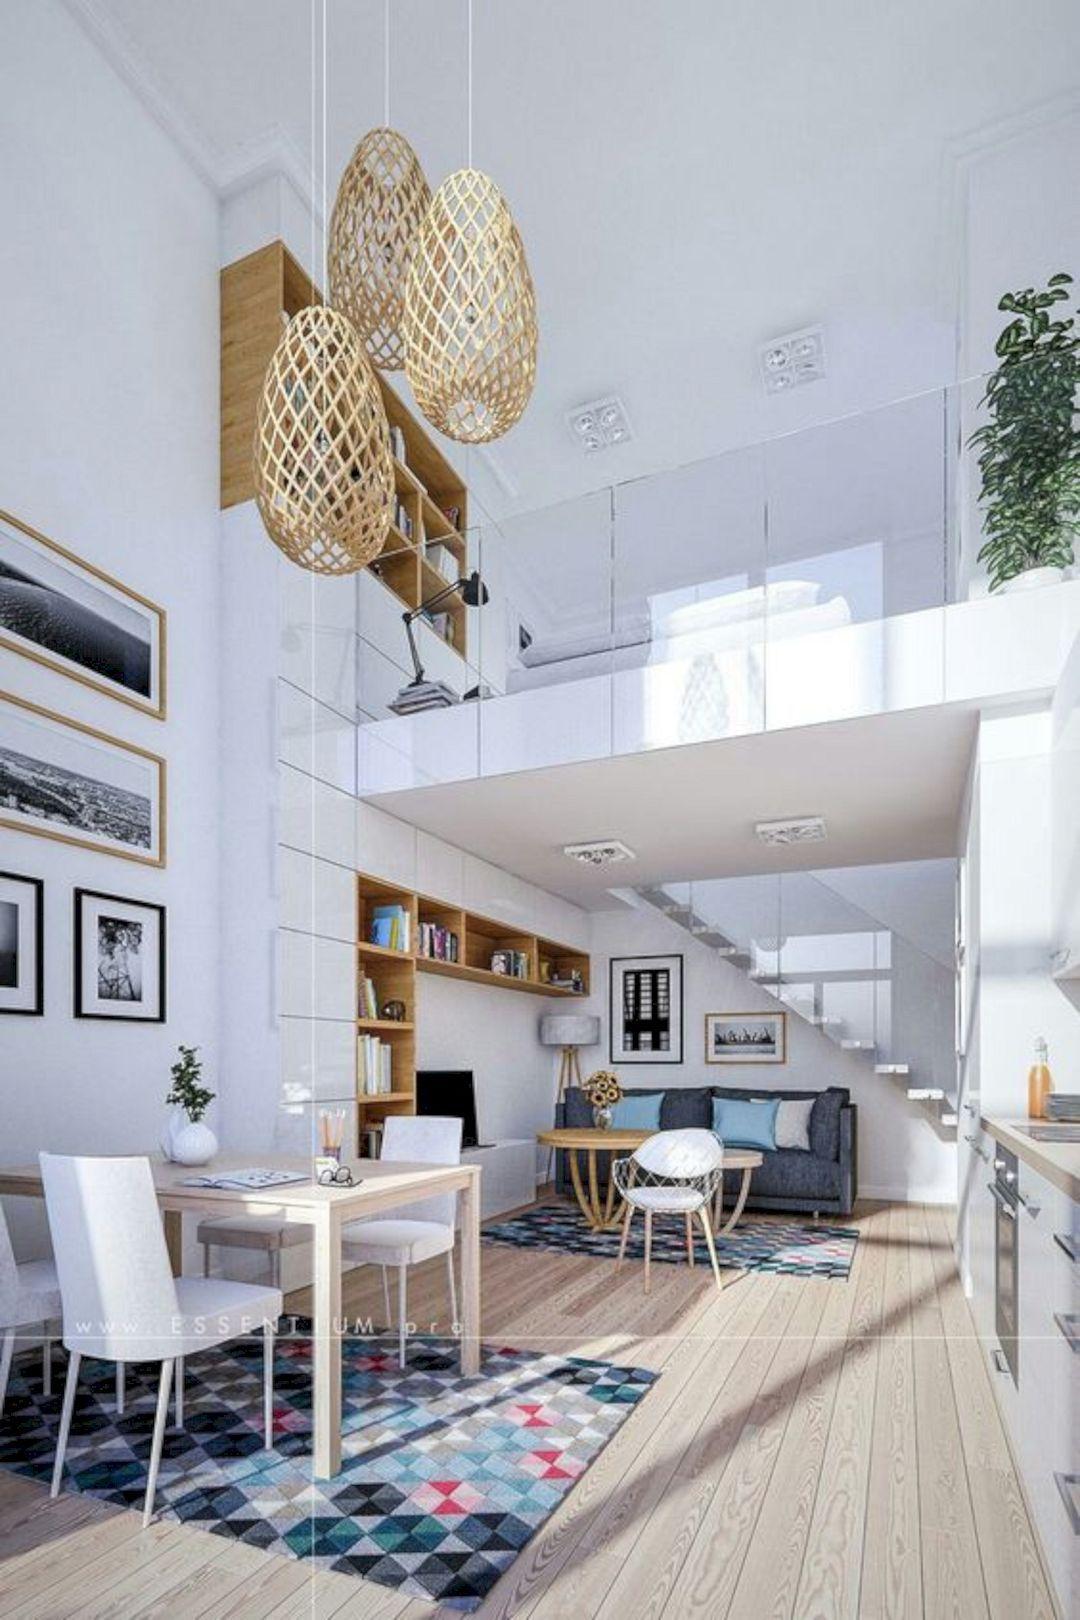 Ordinaire 15 Superb Loft Furniture Ideas You Should Consider Having  Https://www.futuristarchitecture